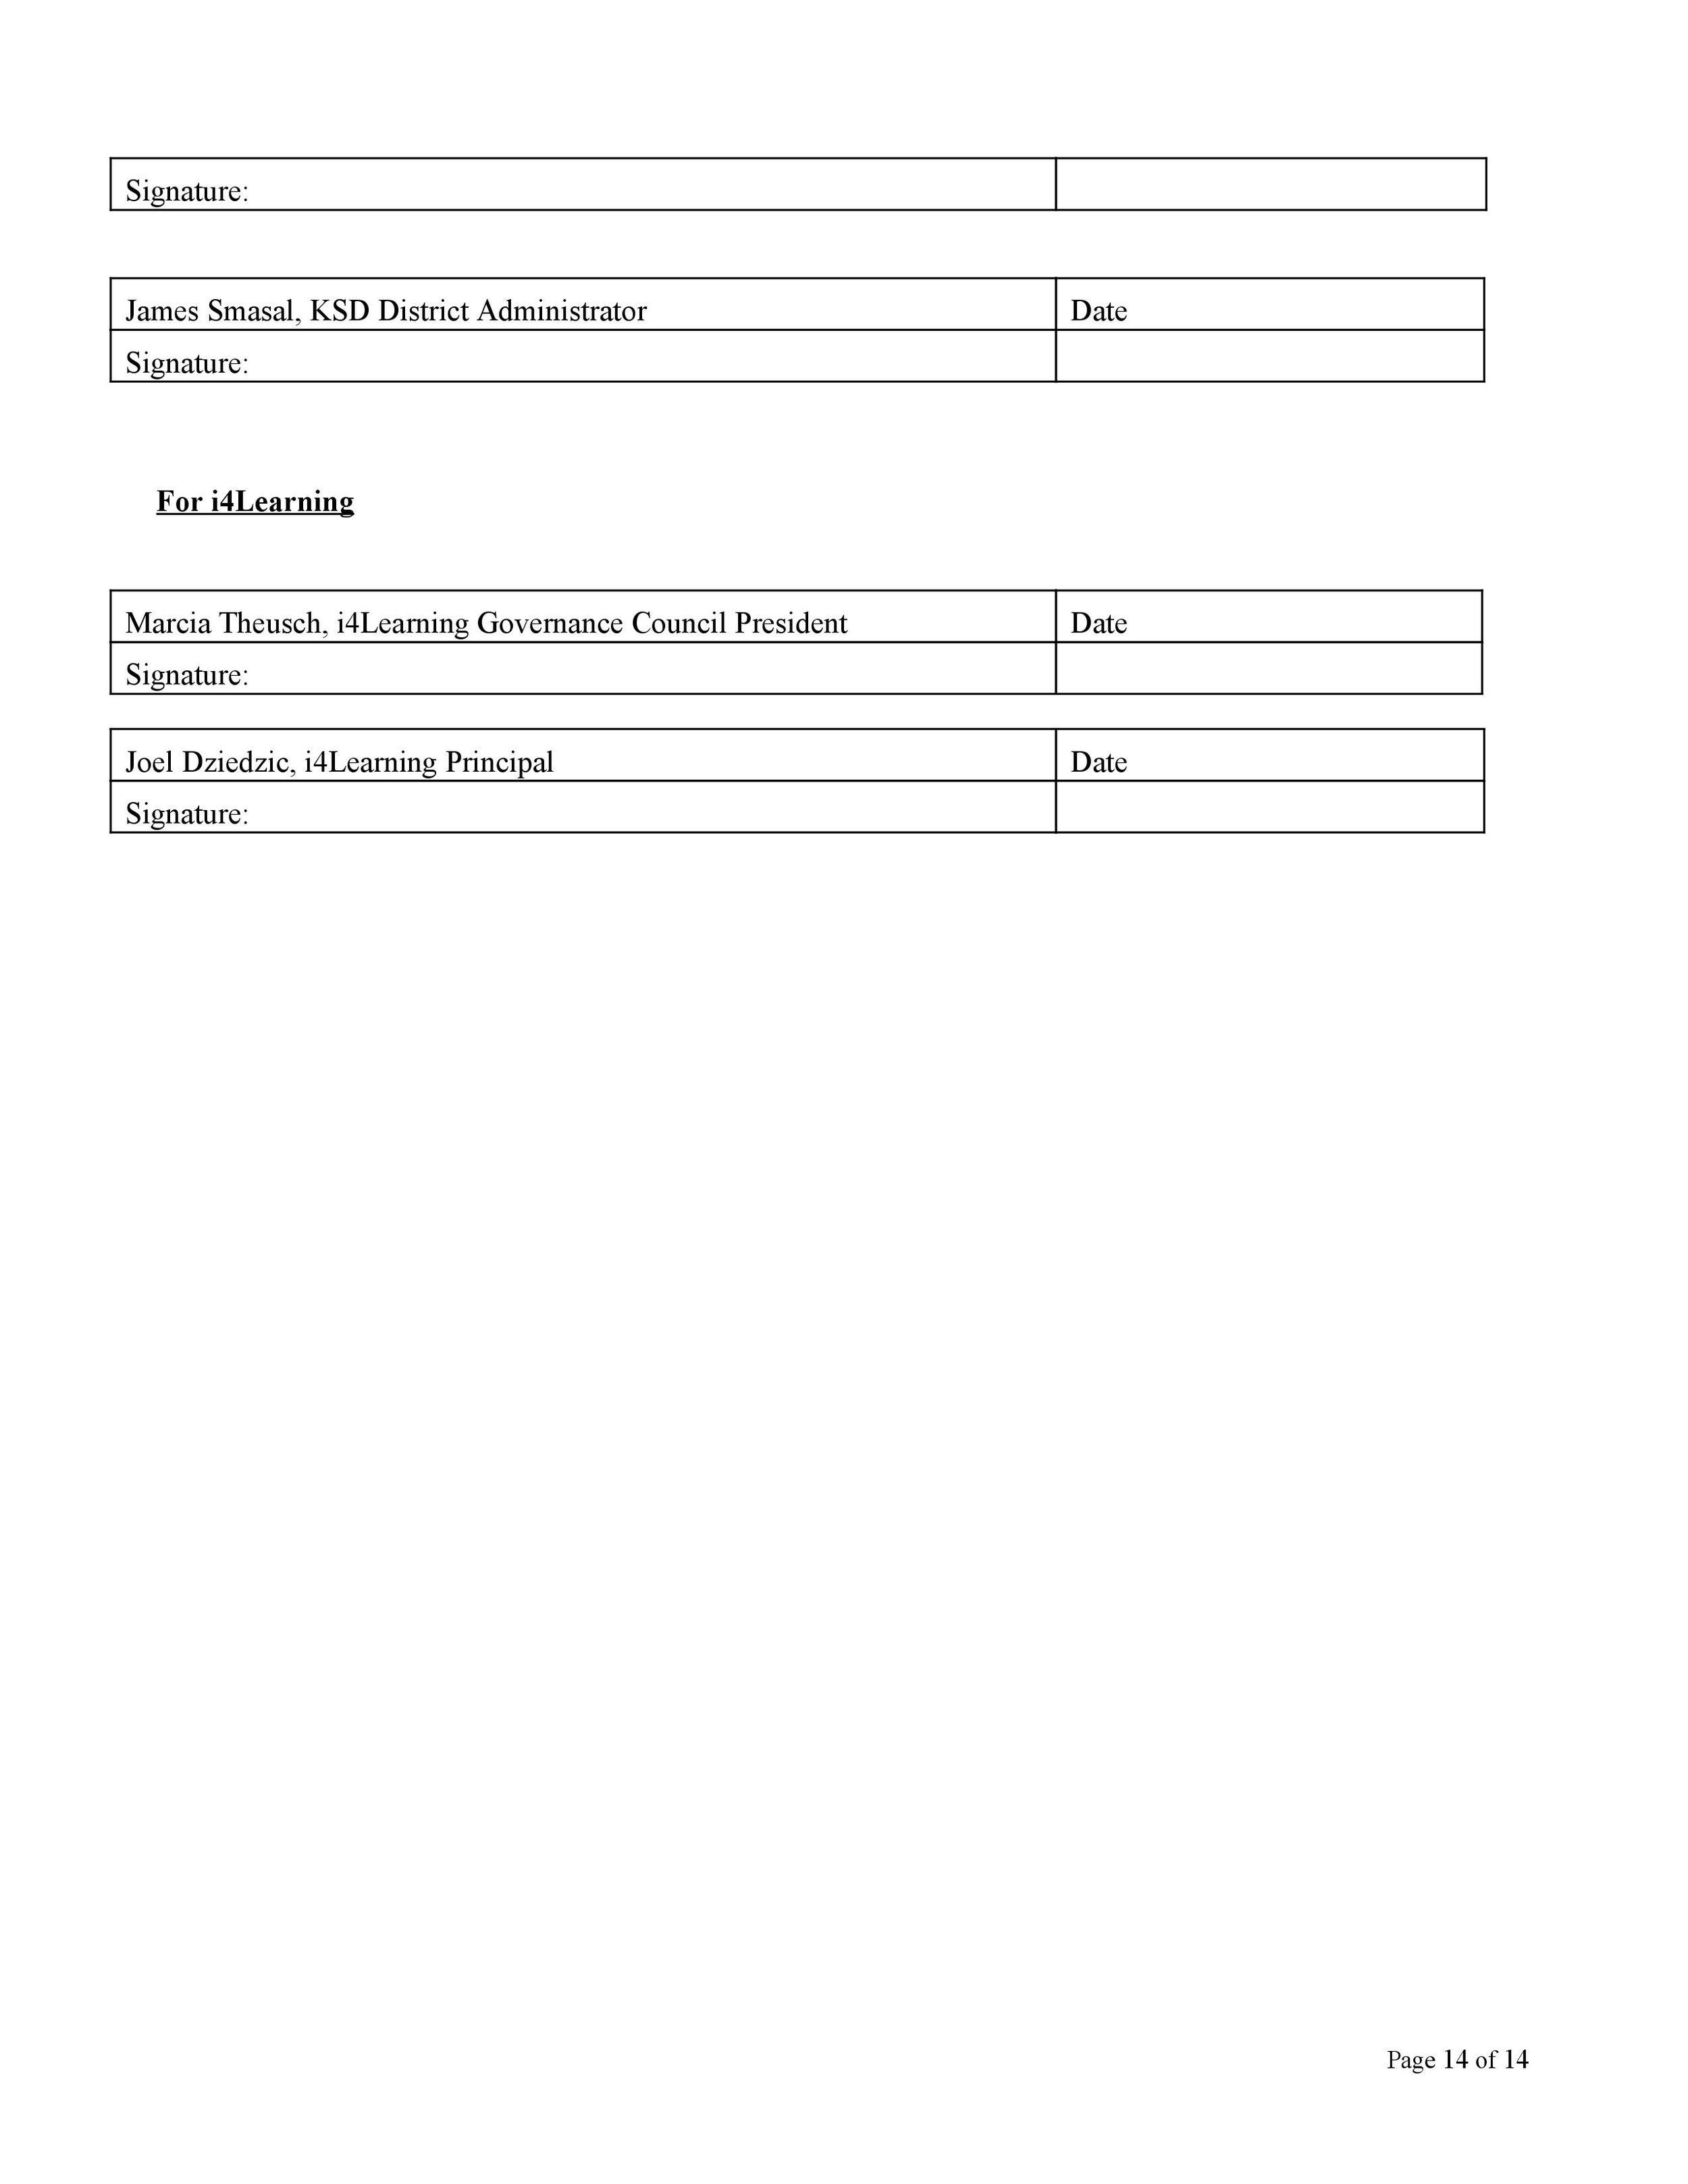 Contract pg 14.jpg